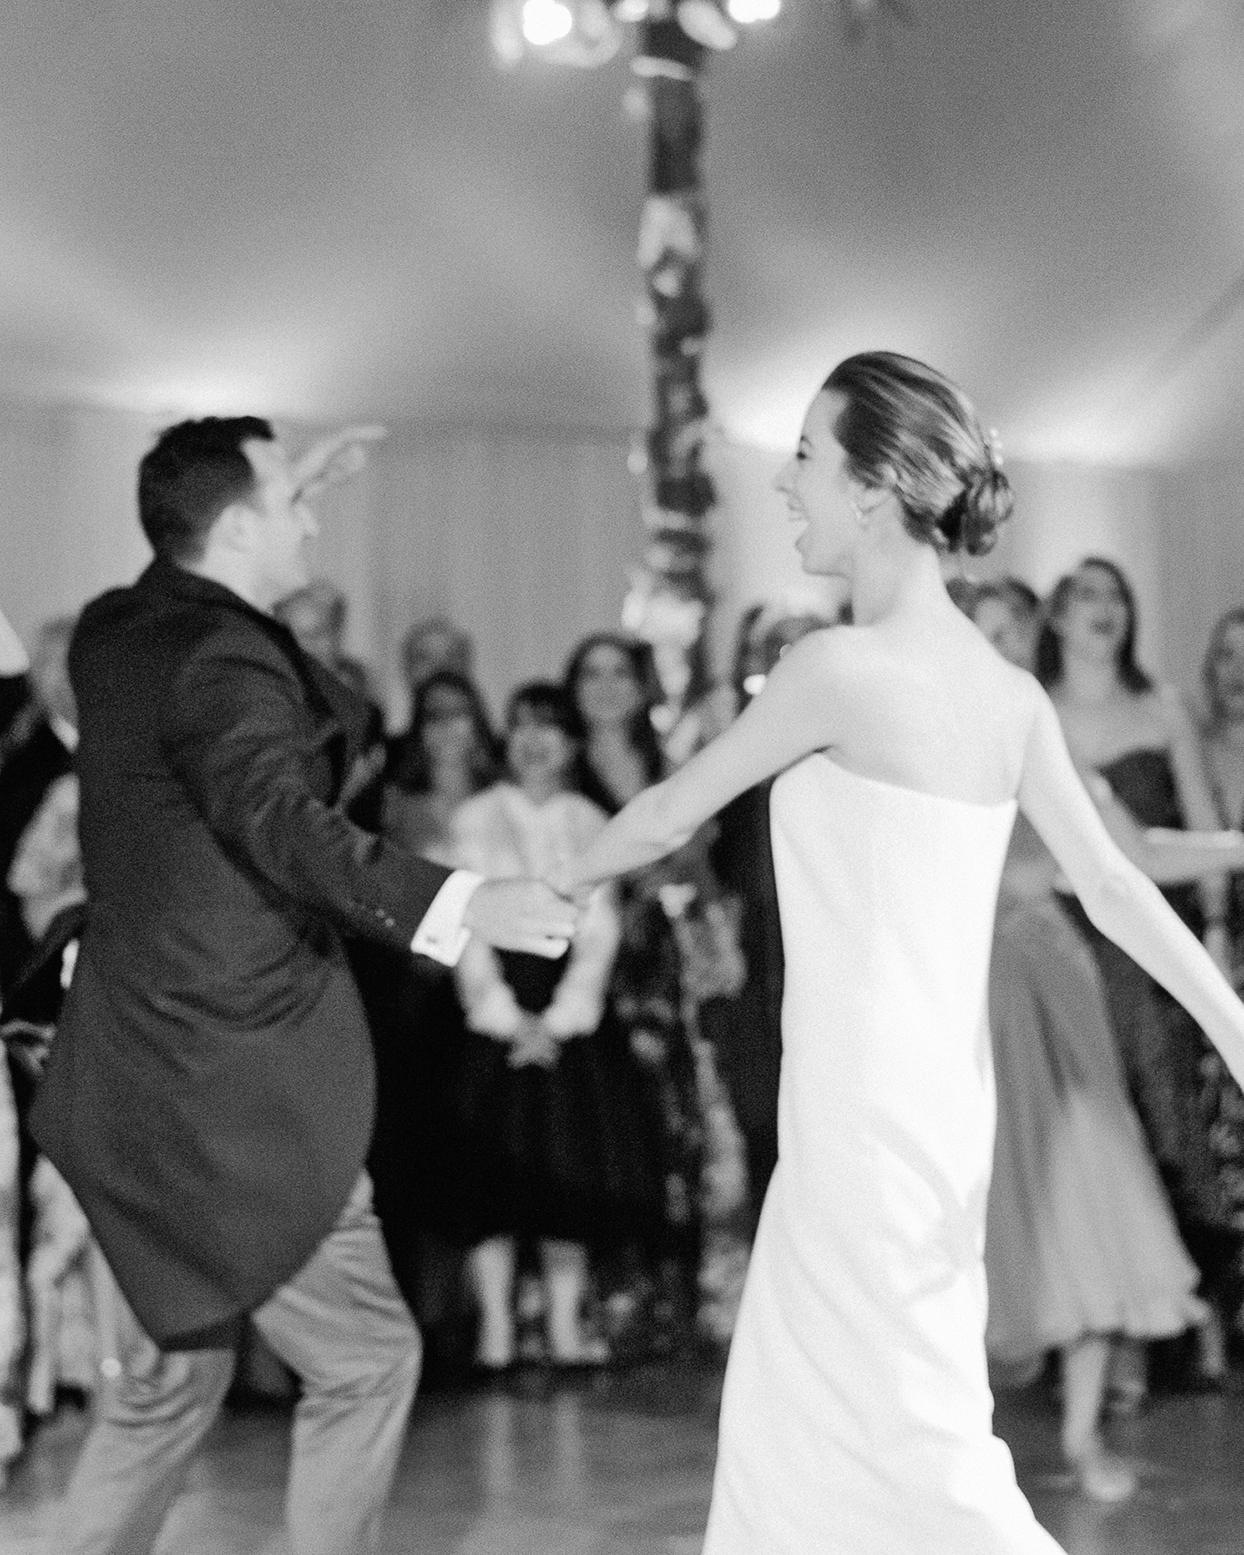 sofia alberto wedding reception first dance